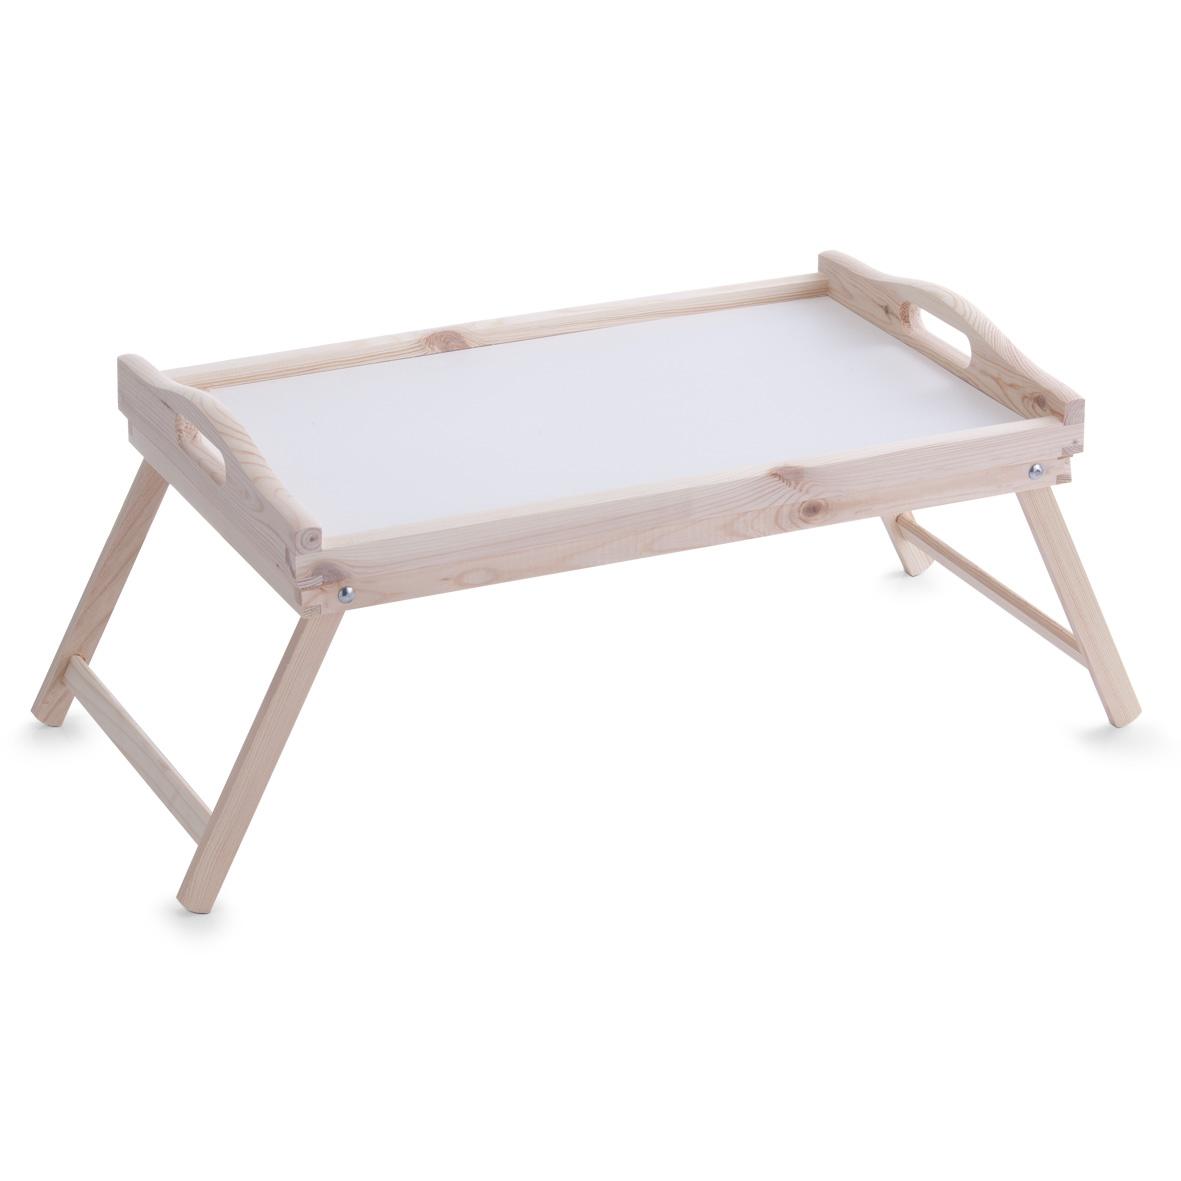 Masuta pliabila servire pat, Natural, din lemn de pin, L50xl30xH24,5 cm imagine